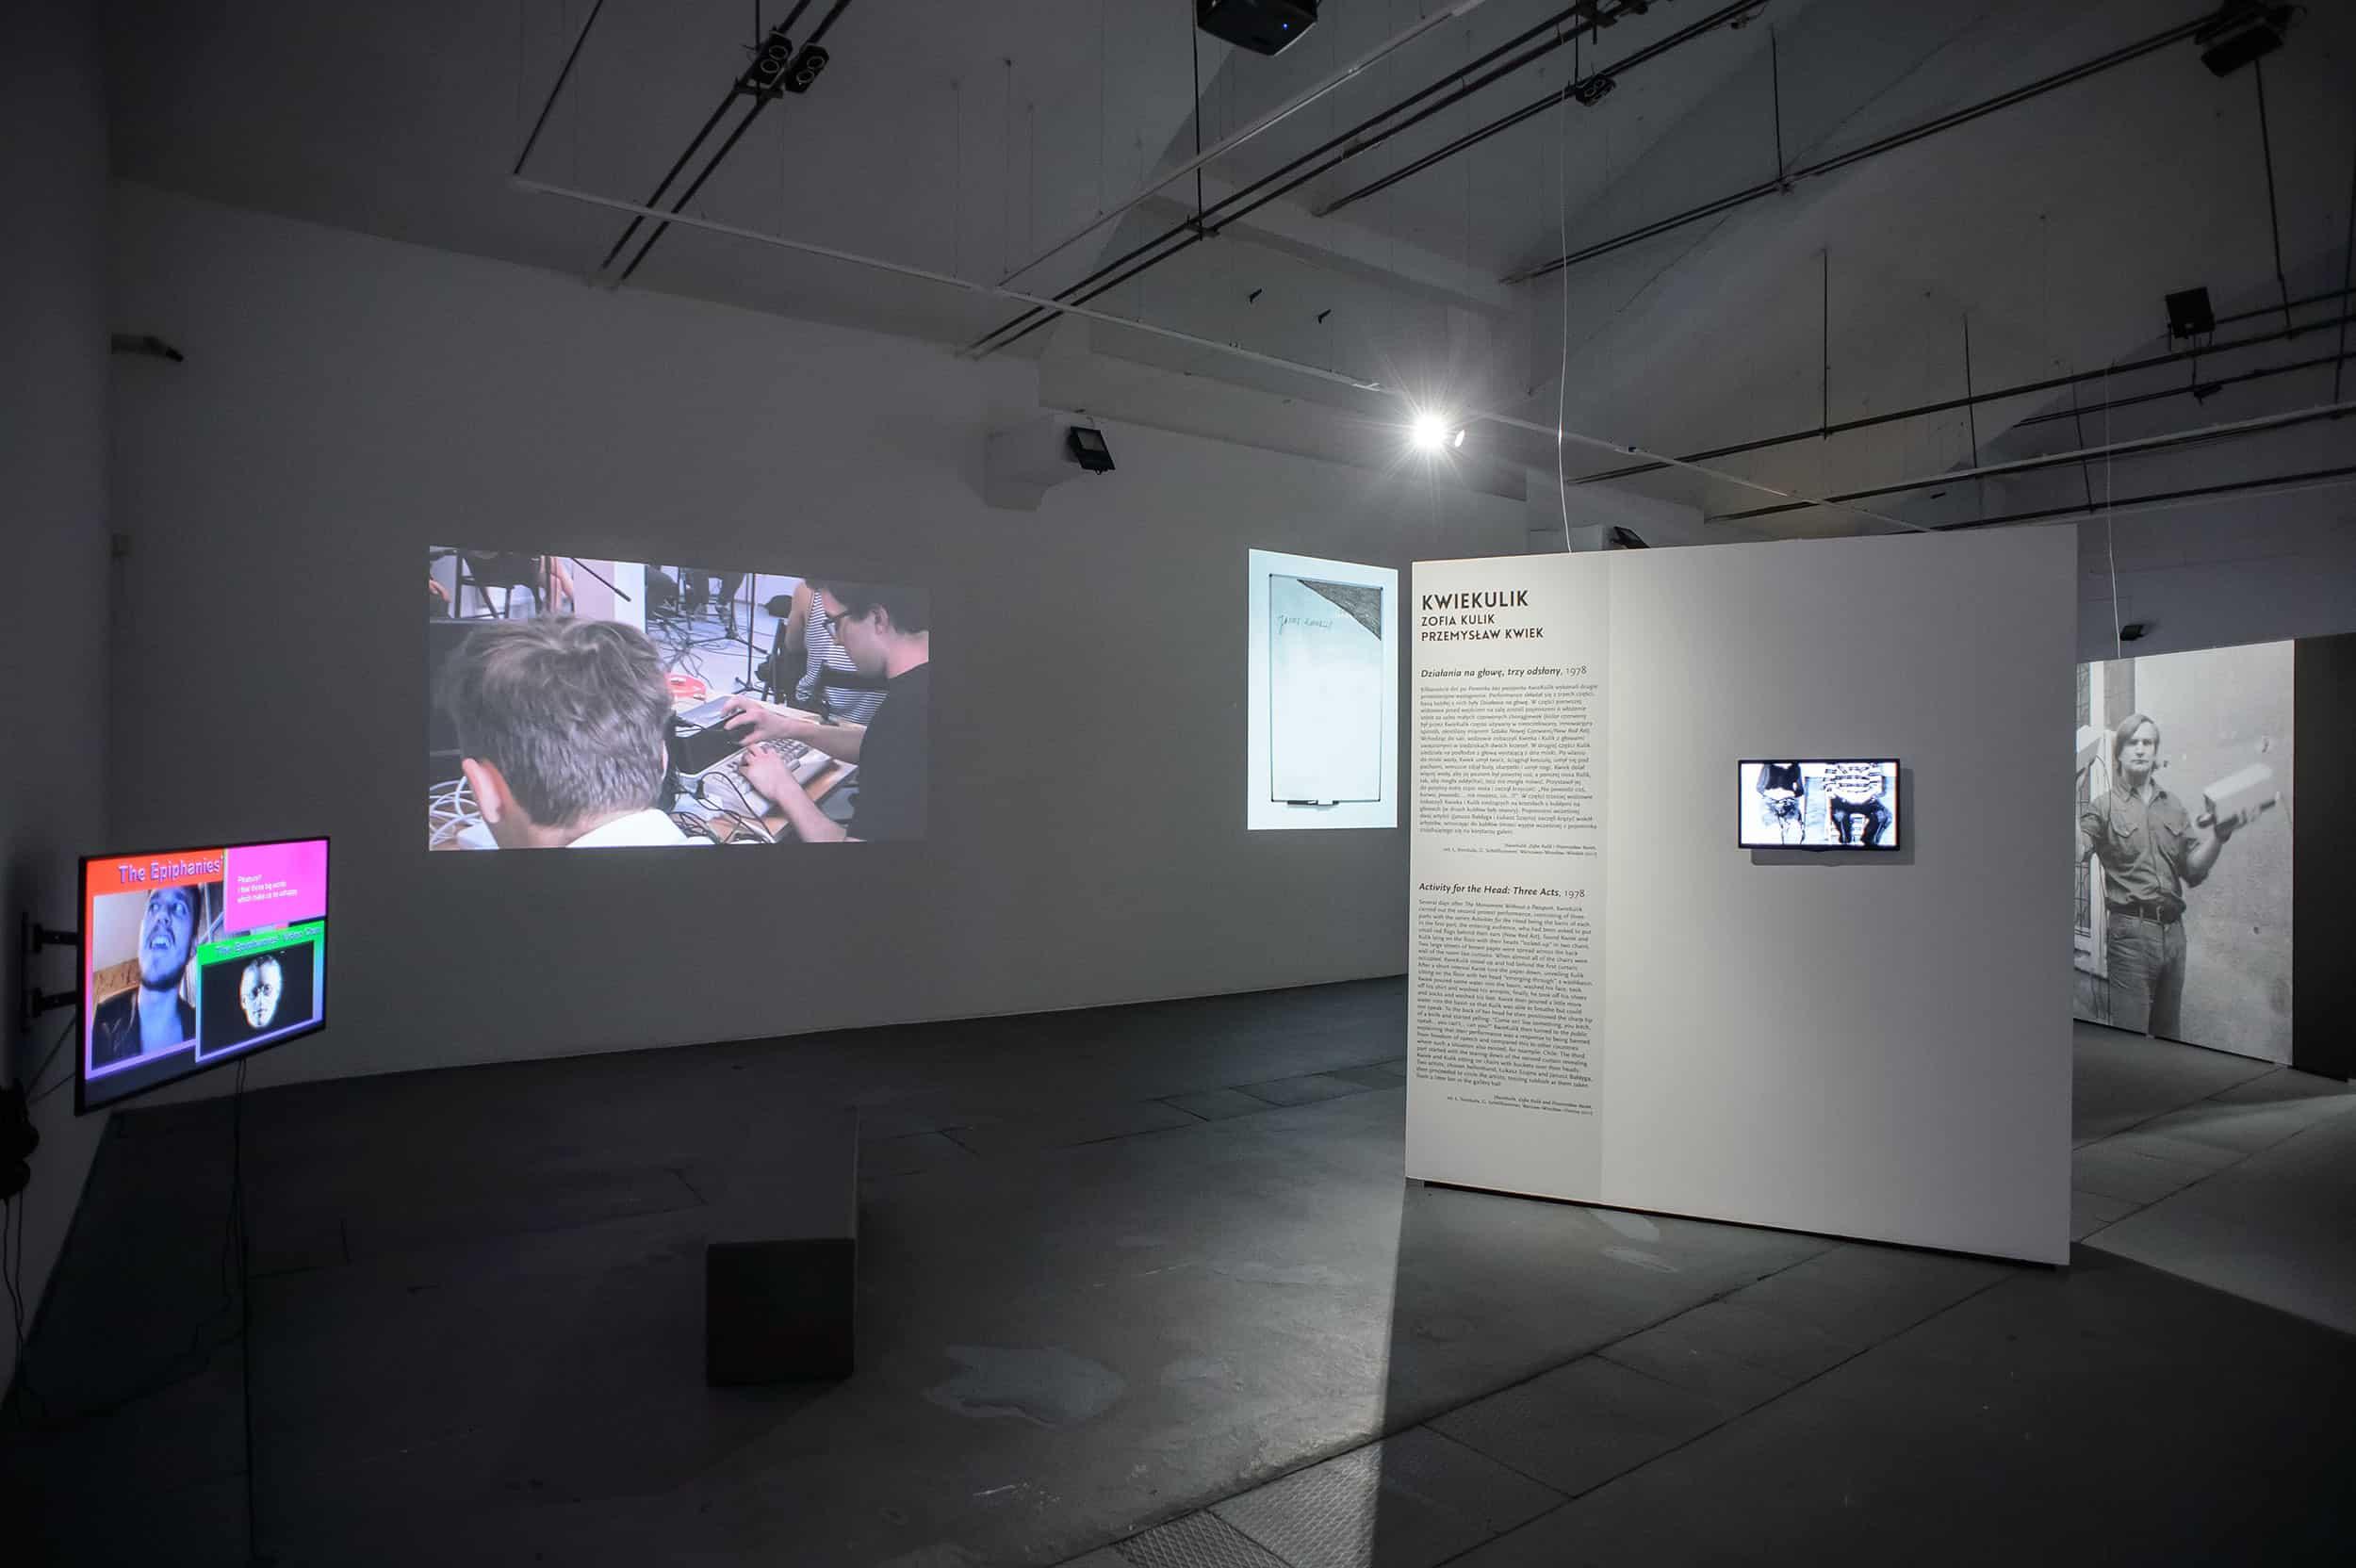 Exhibition D View : Salon d art with franziska stuenkel in hamburg widewalls